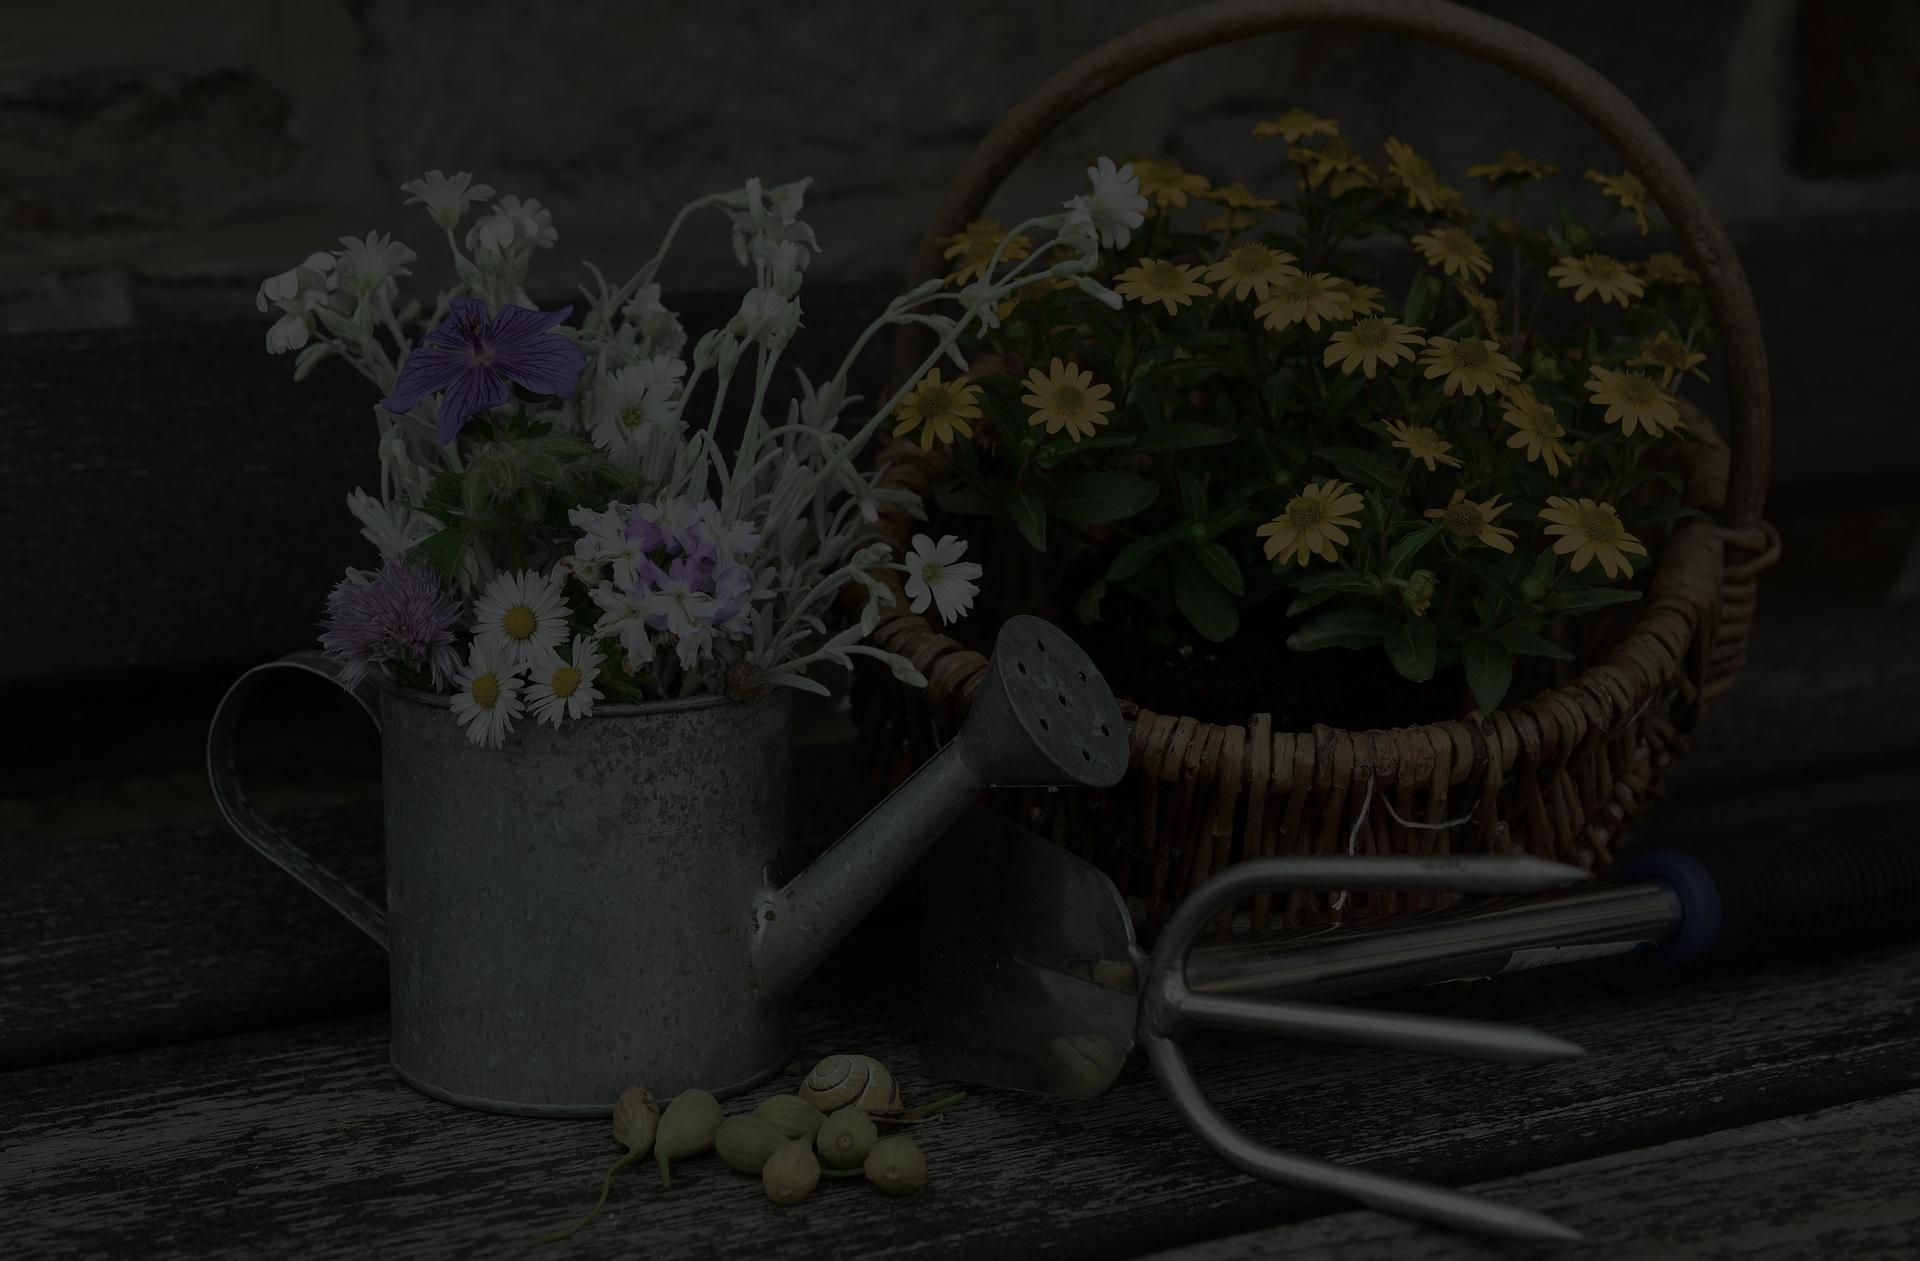 flowers-779317_1920-dark